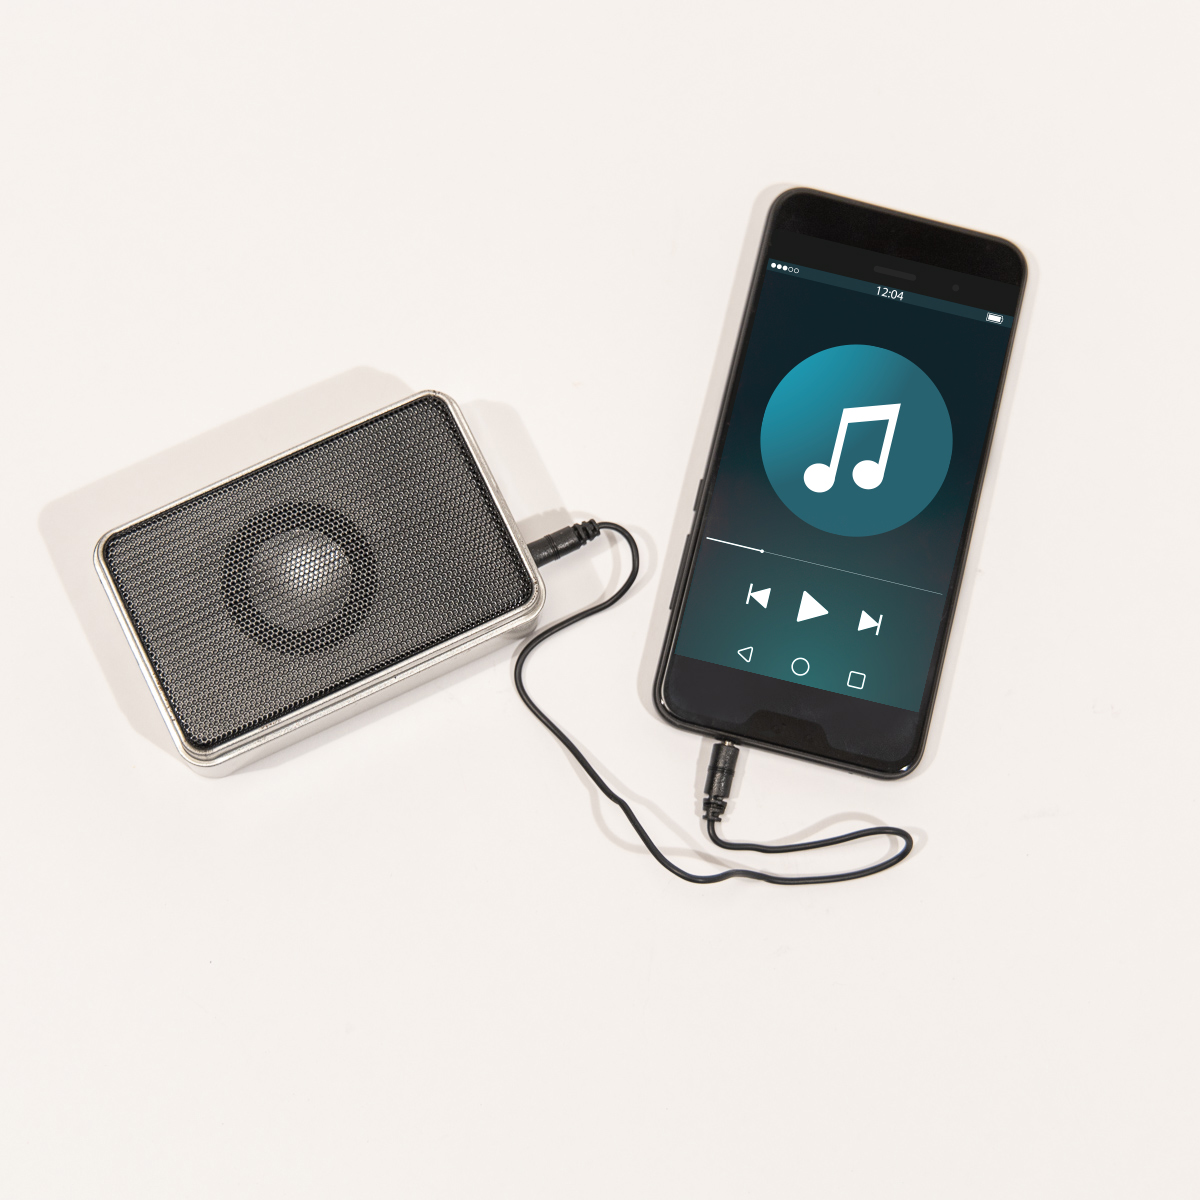 Mini Lautsprecher in der Blechdose